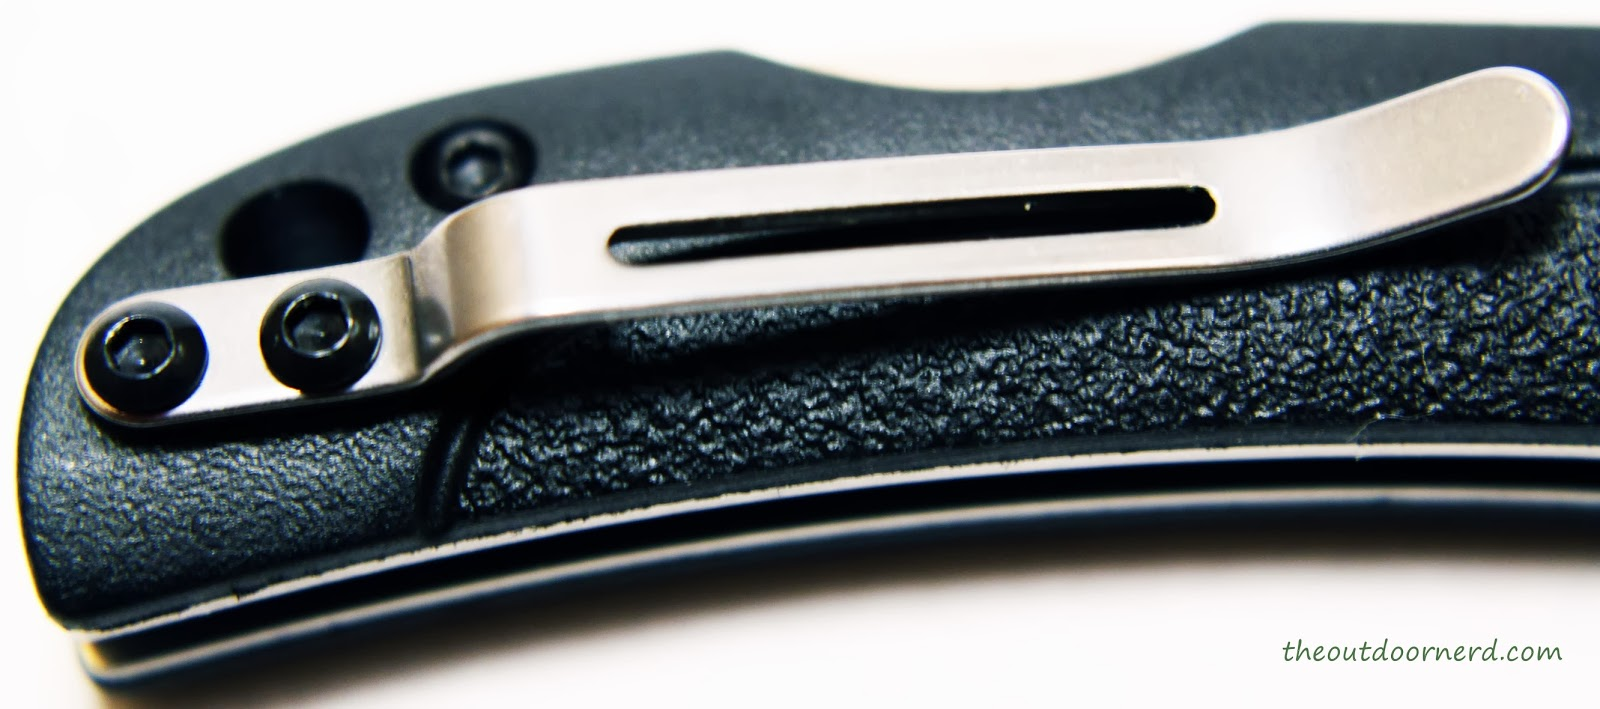 SanRenMu ZB-681 Pocket Knife - Closeup Of Clip